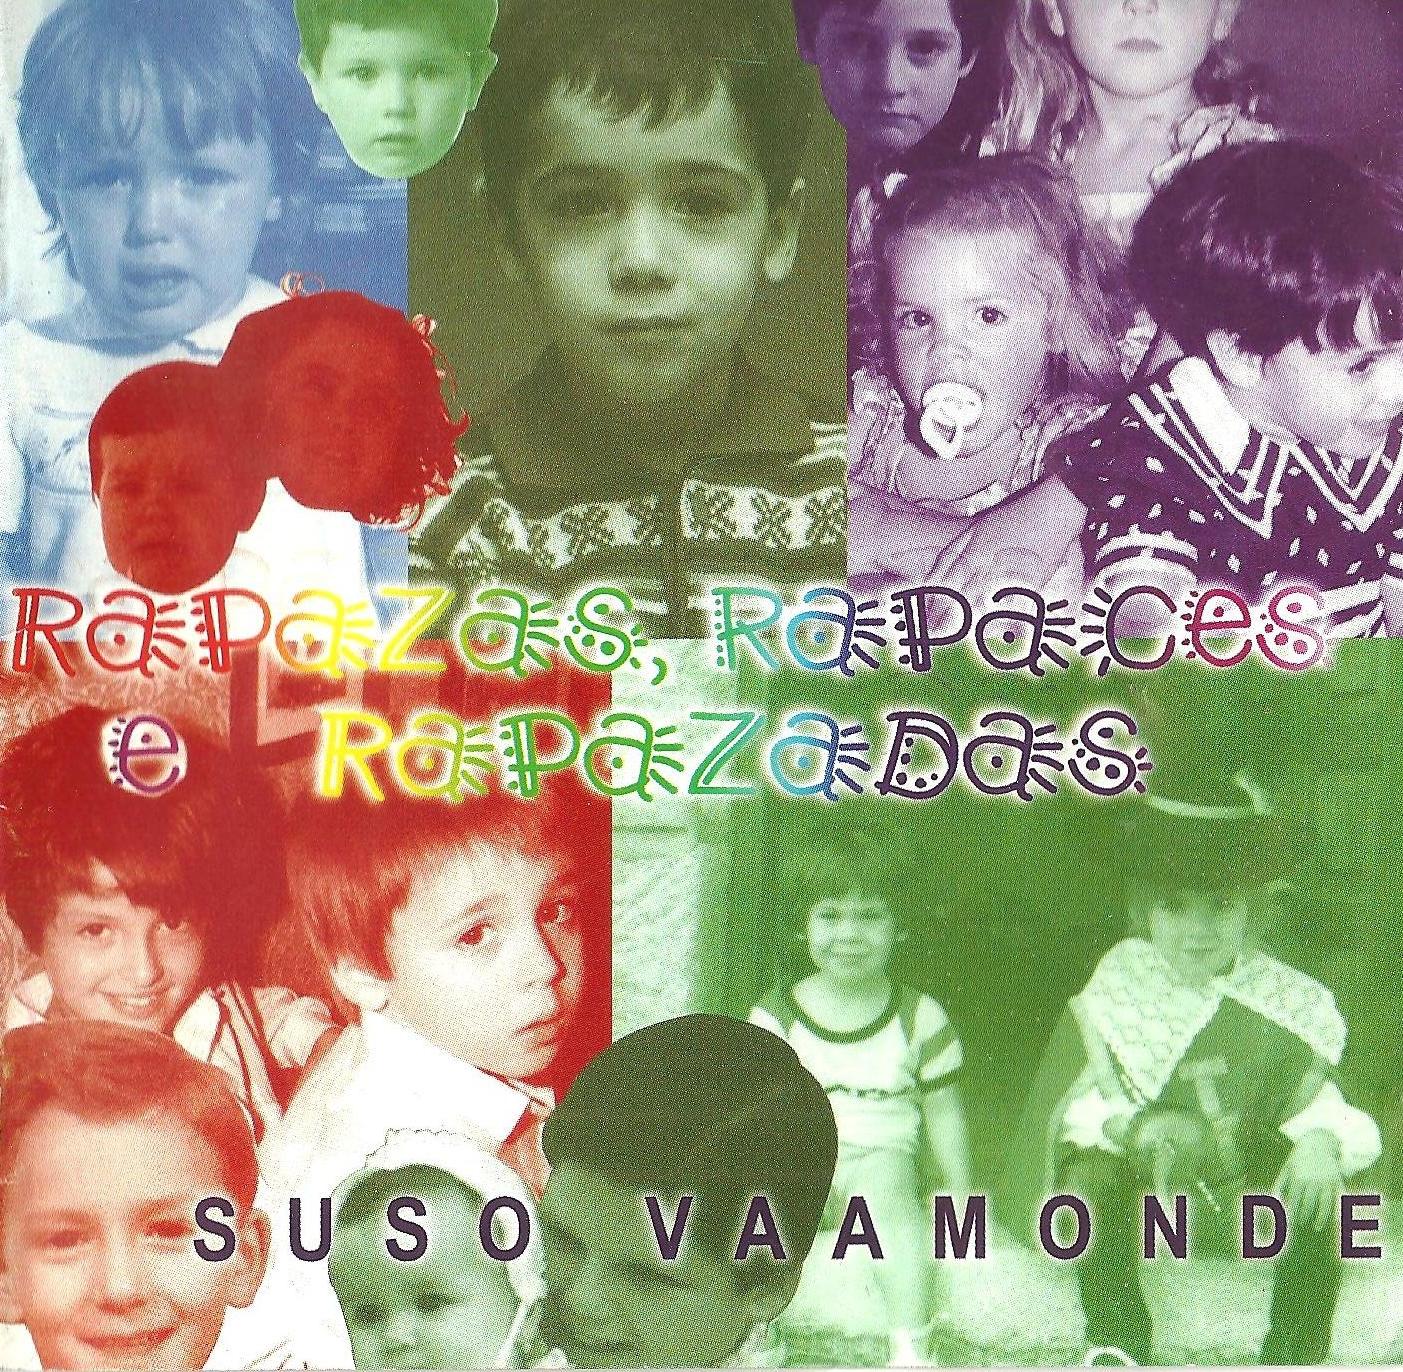 portada del album Rapazas, Rapaces e Rapazadas